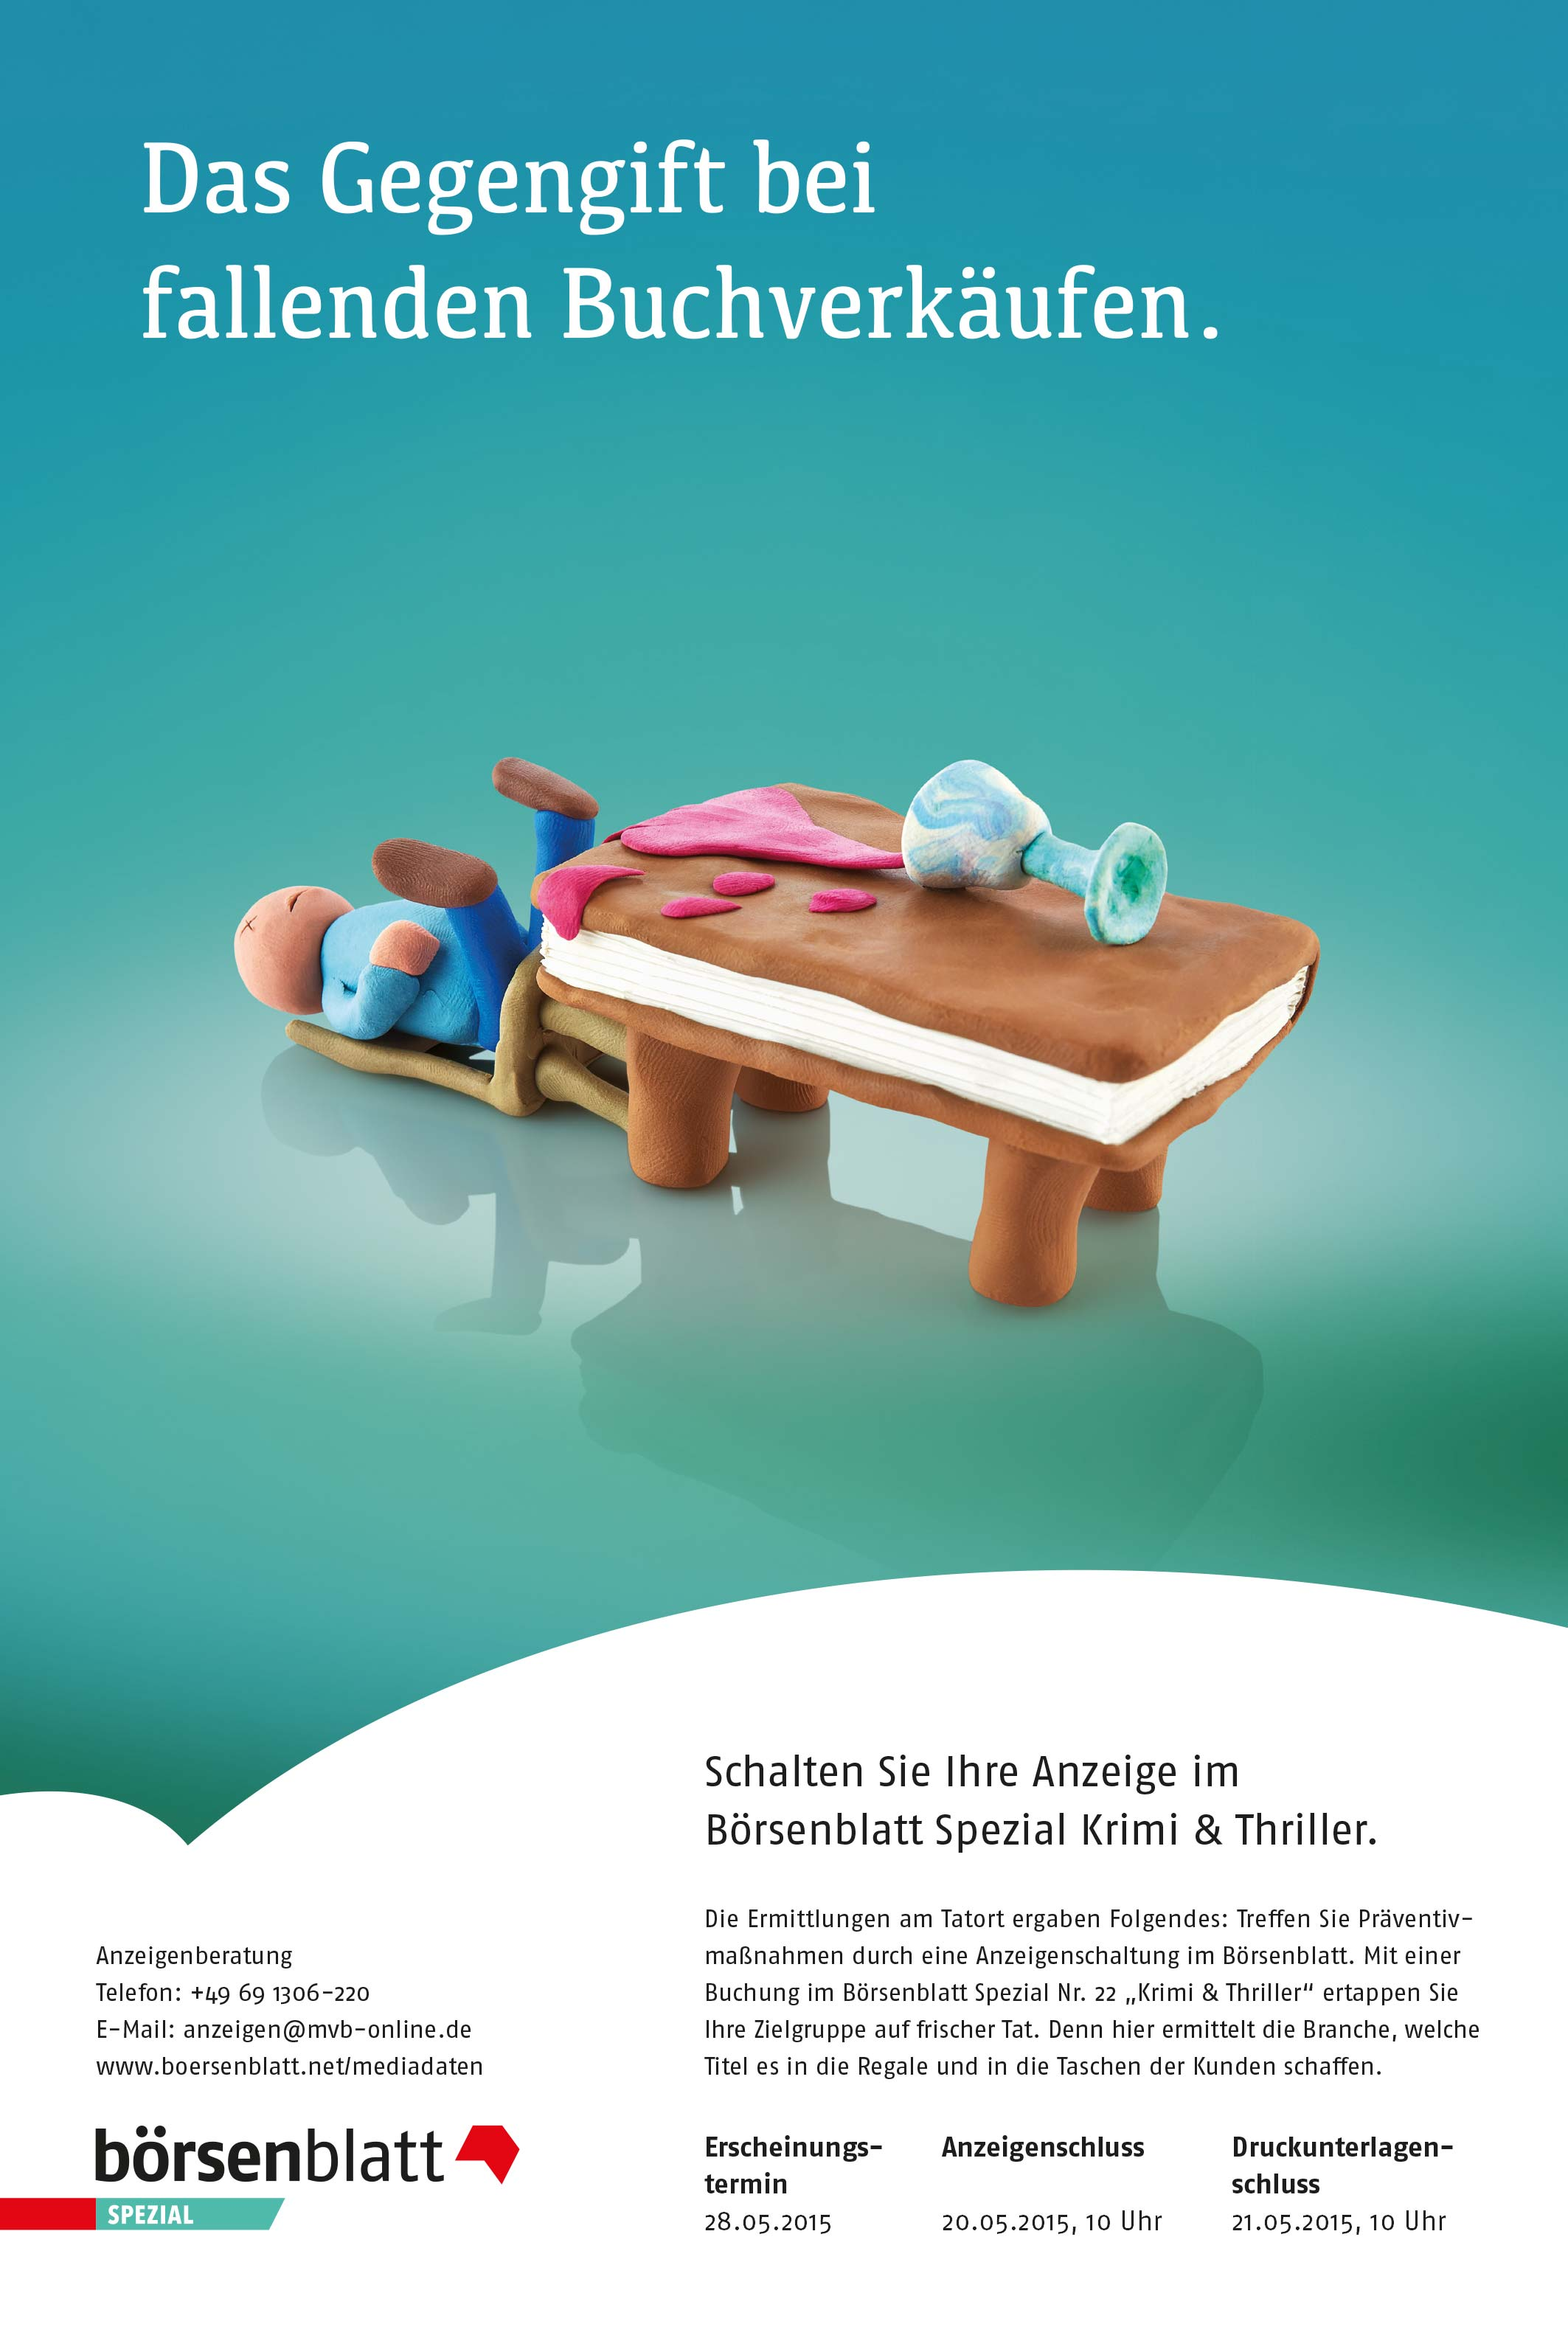 Anzeigenserie_Knetfiguren_Börsenblatt_Spezial_Sachbuch Krimi